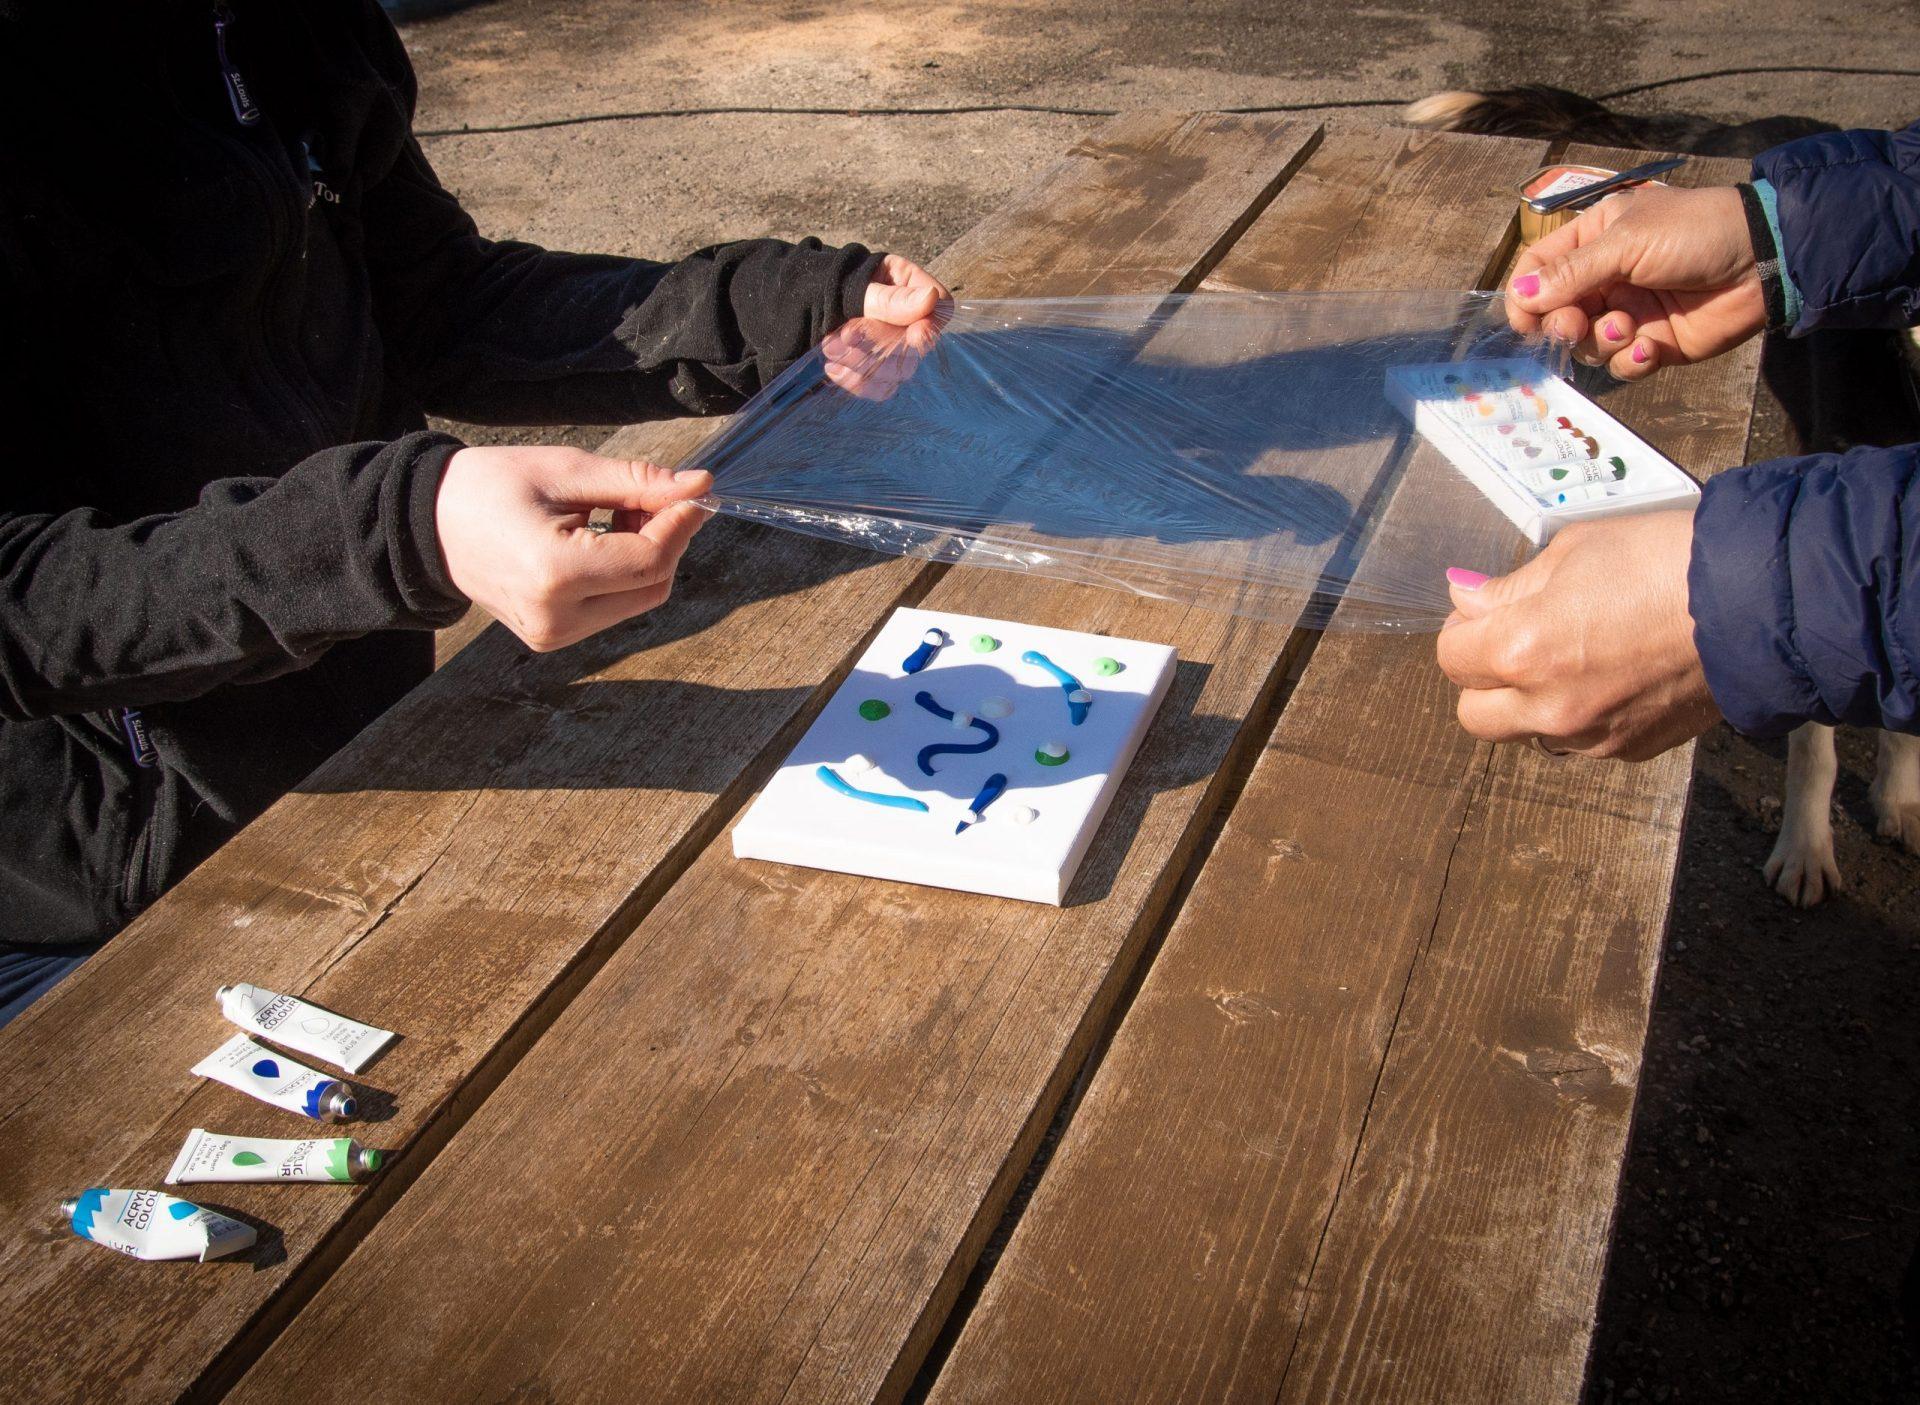 preparing dog painting challenge for husky